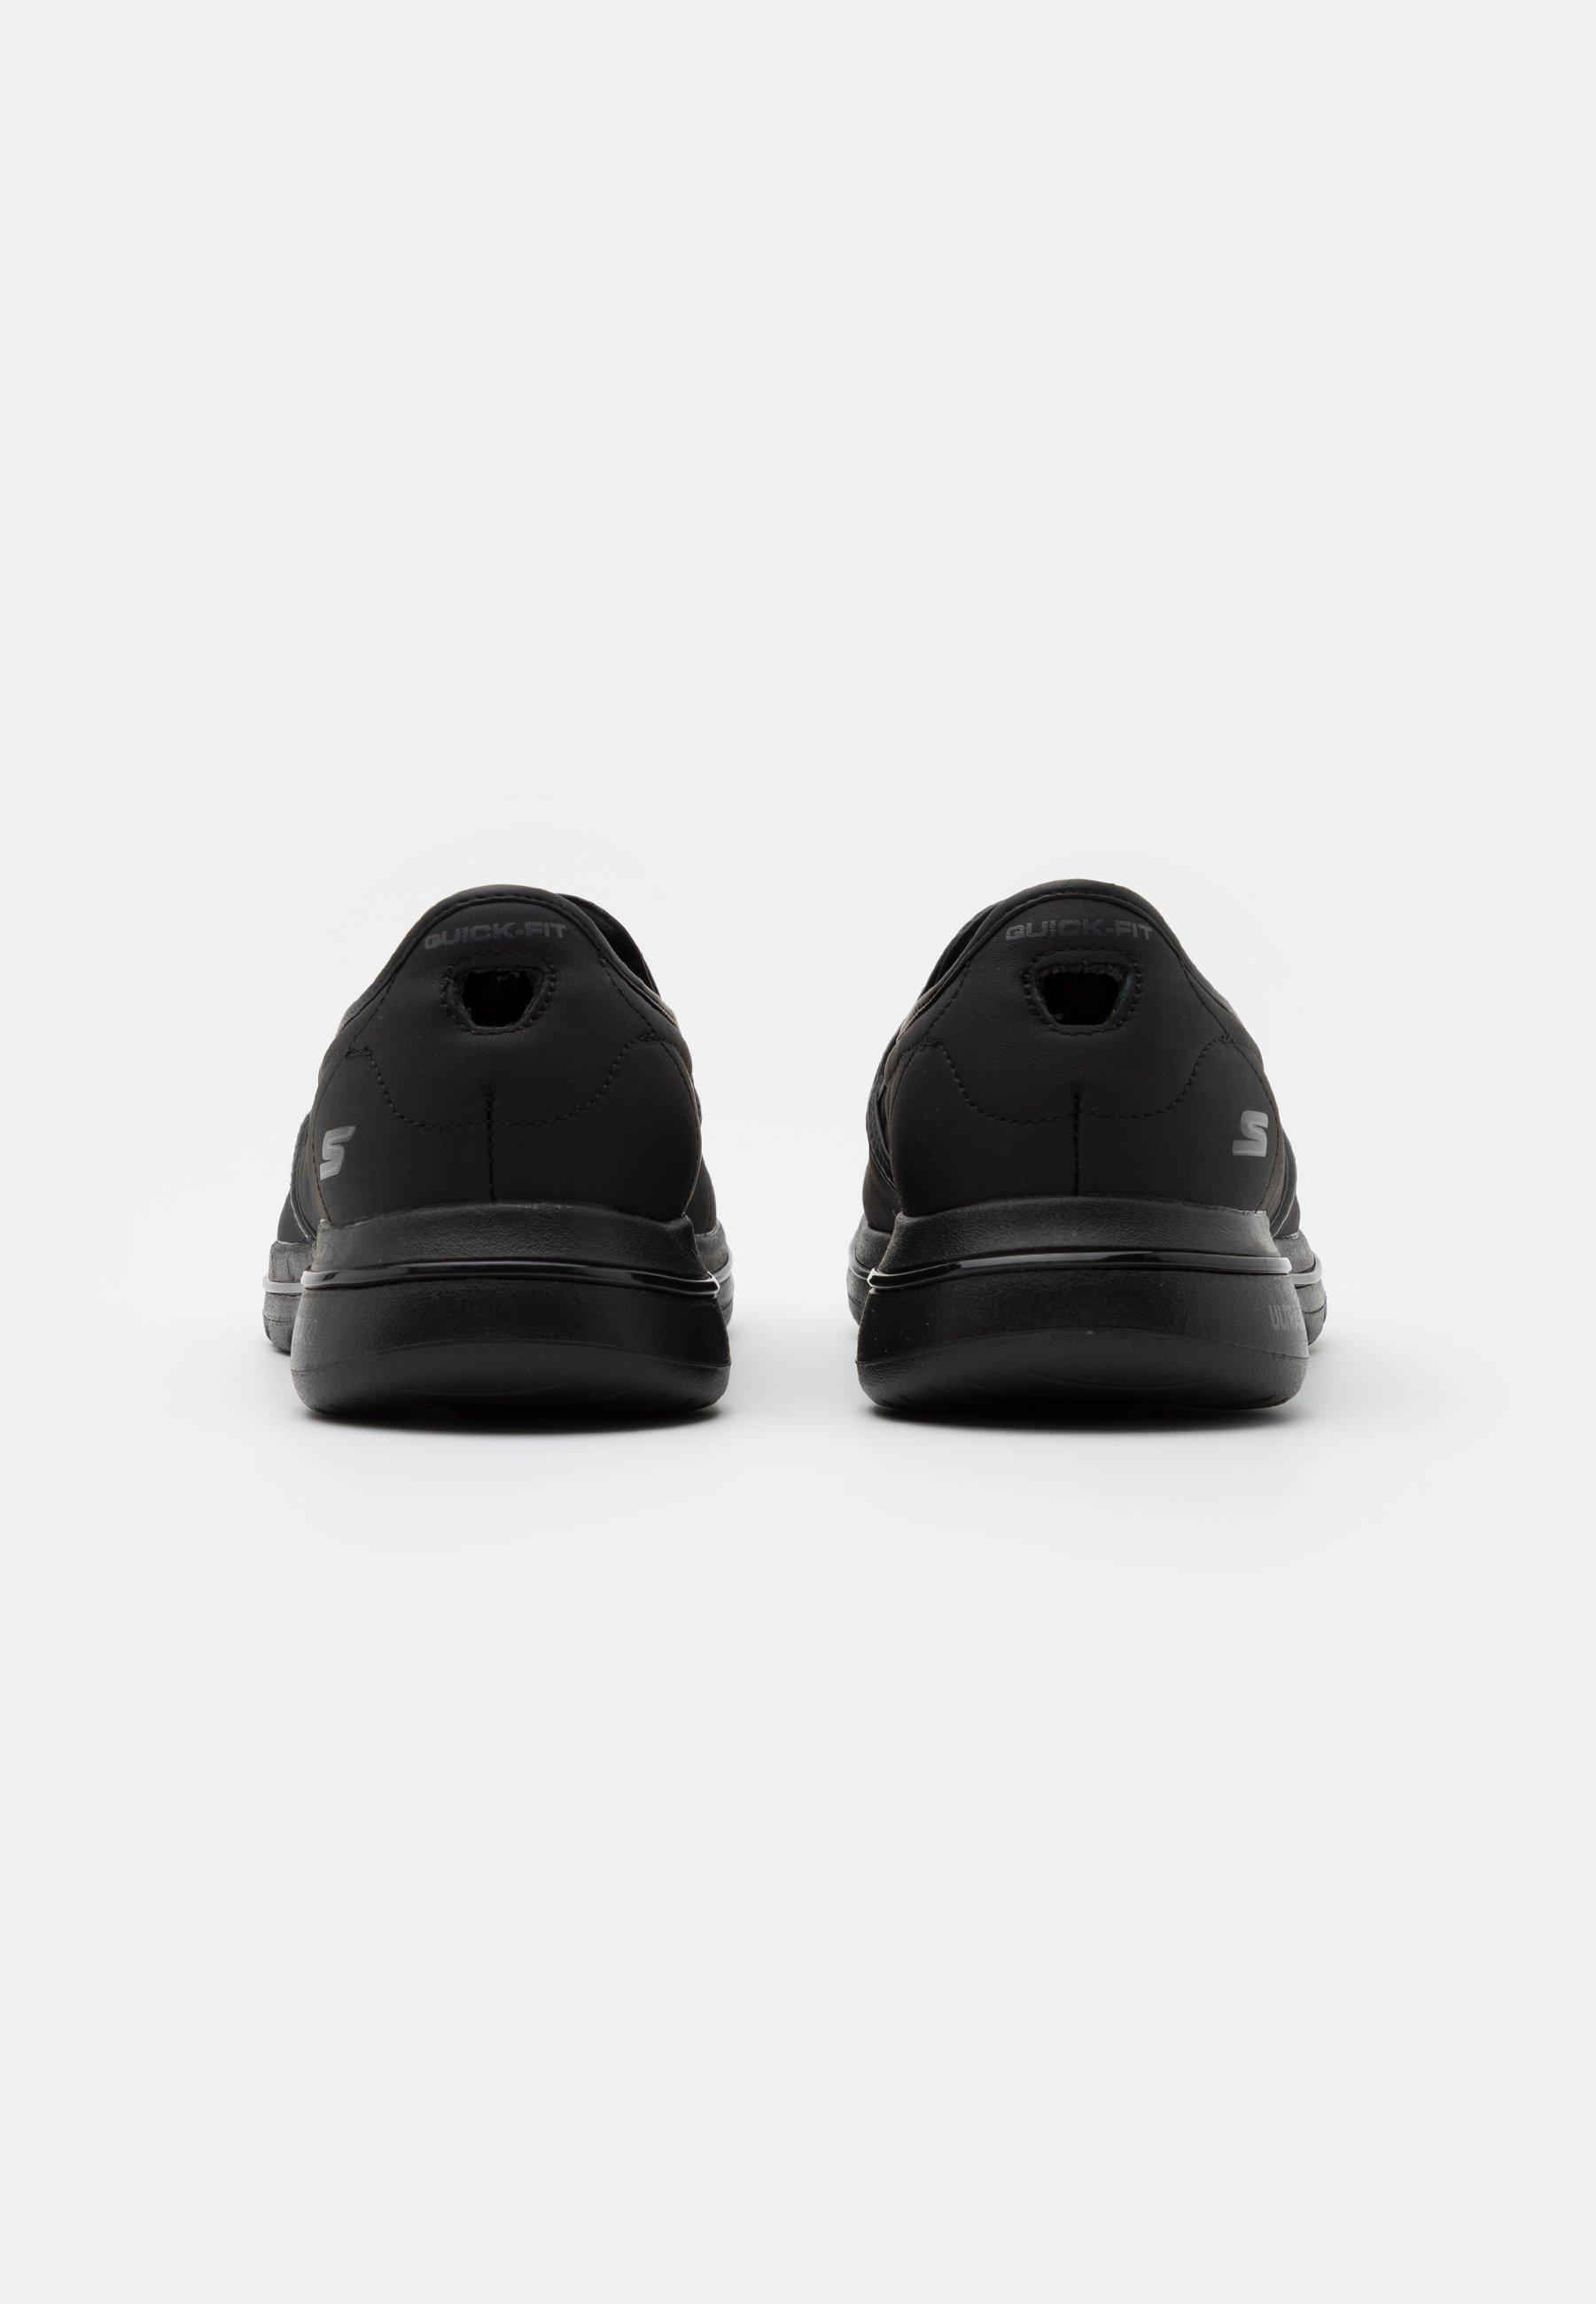 Barato Calzado de hombre Skechers Performance GO WALK 5 Zapatillas para caminar black iczf8l